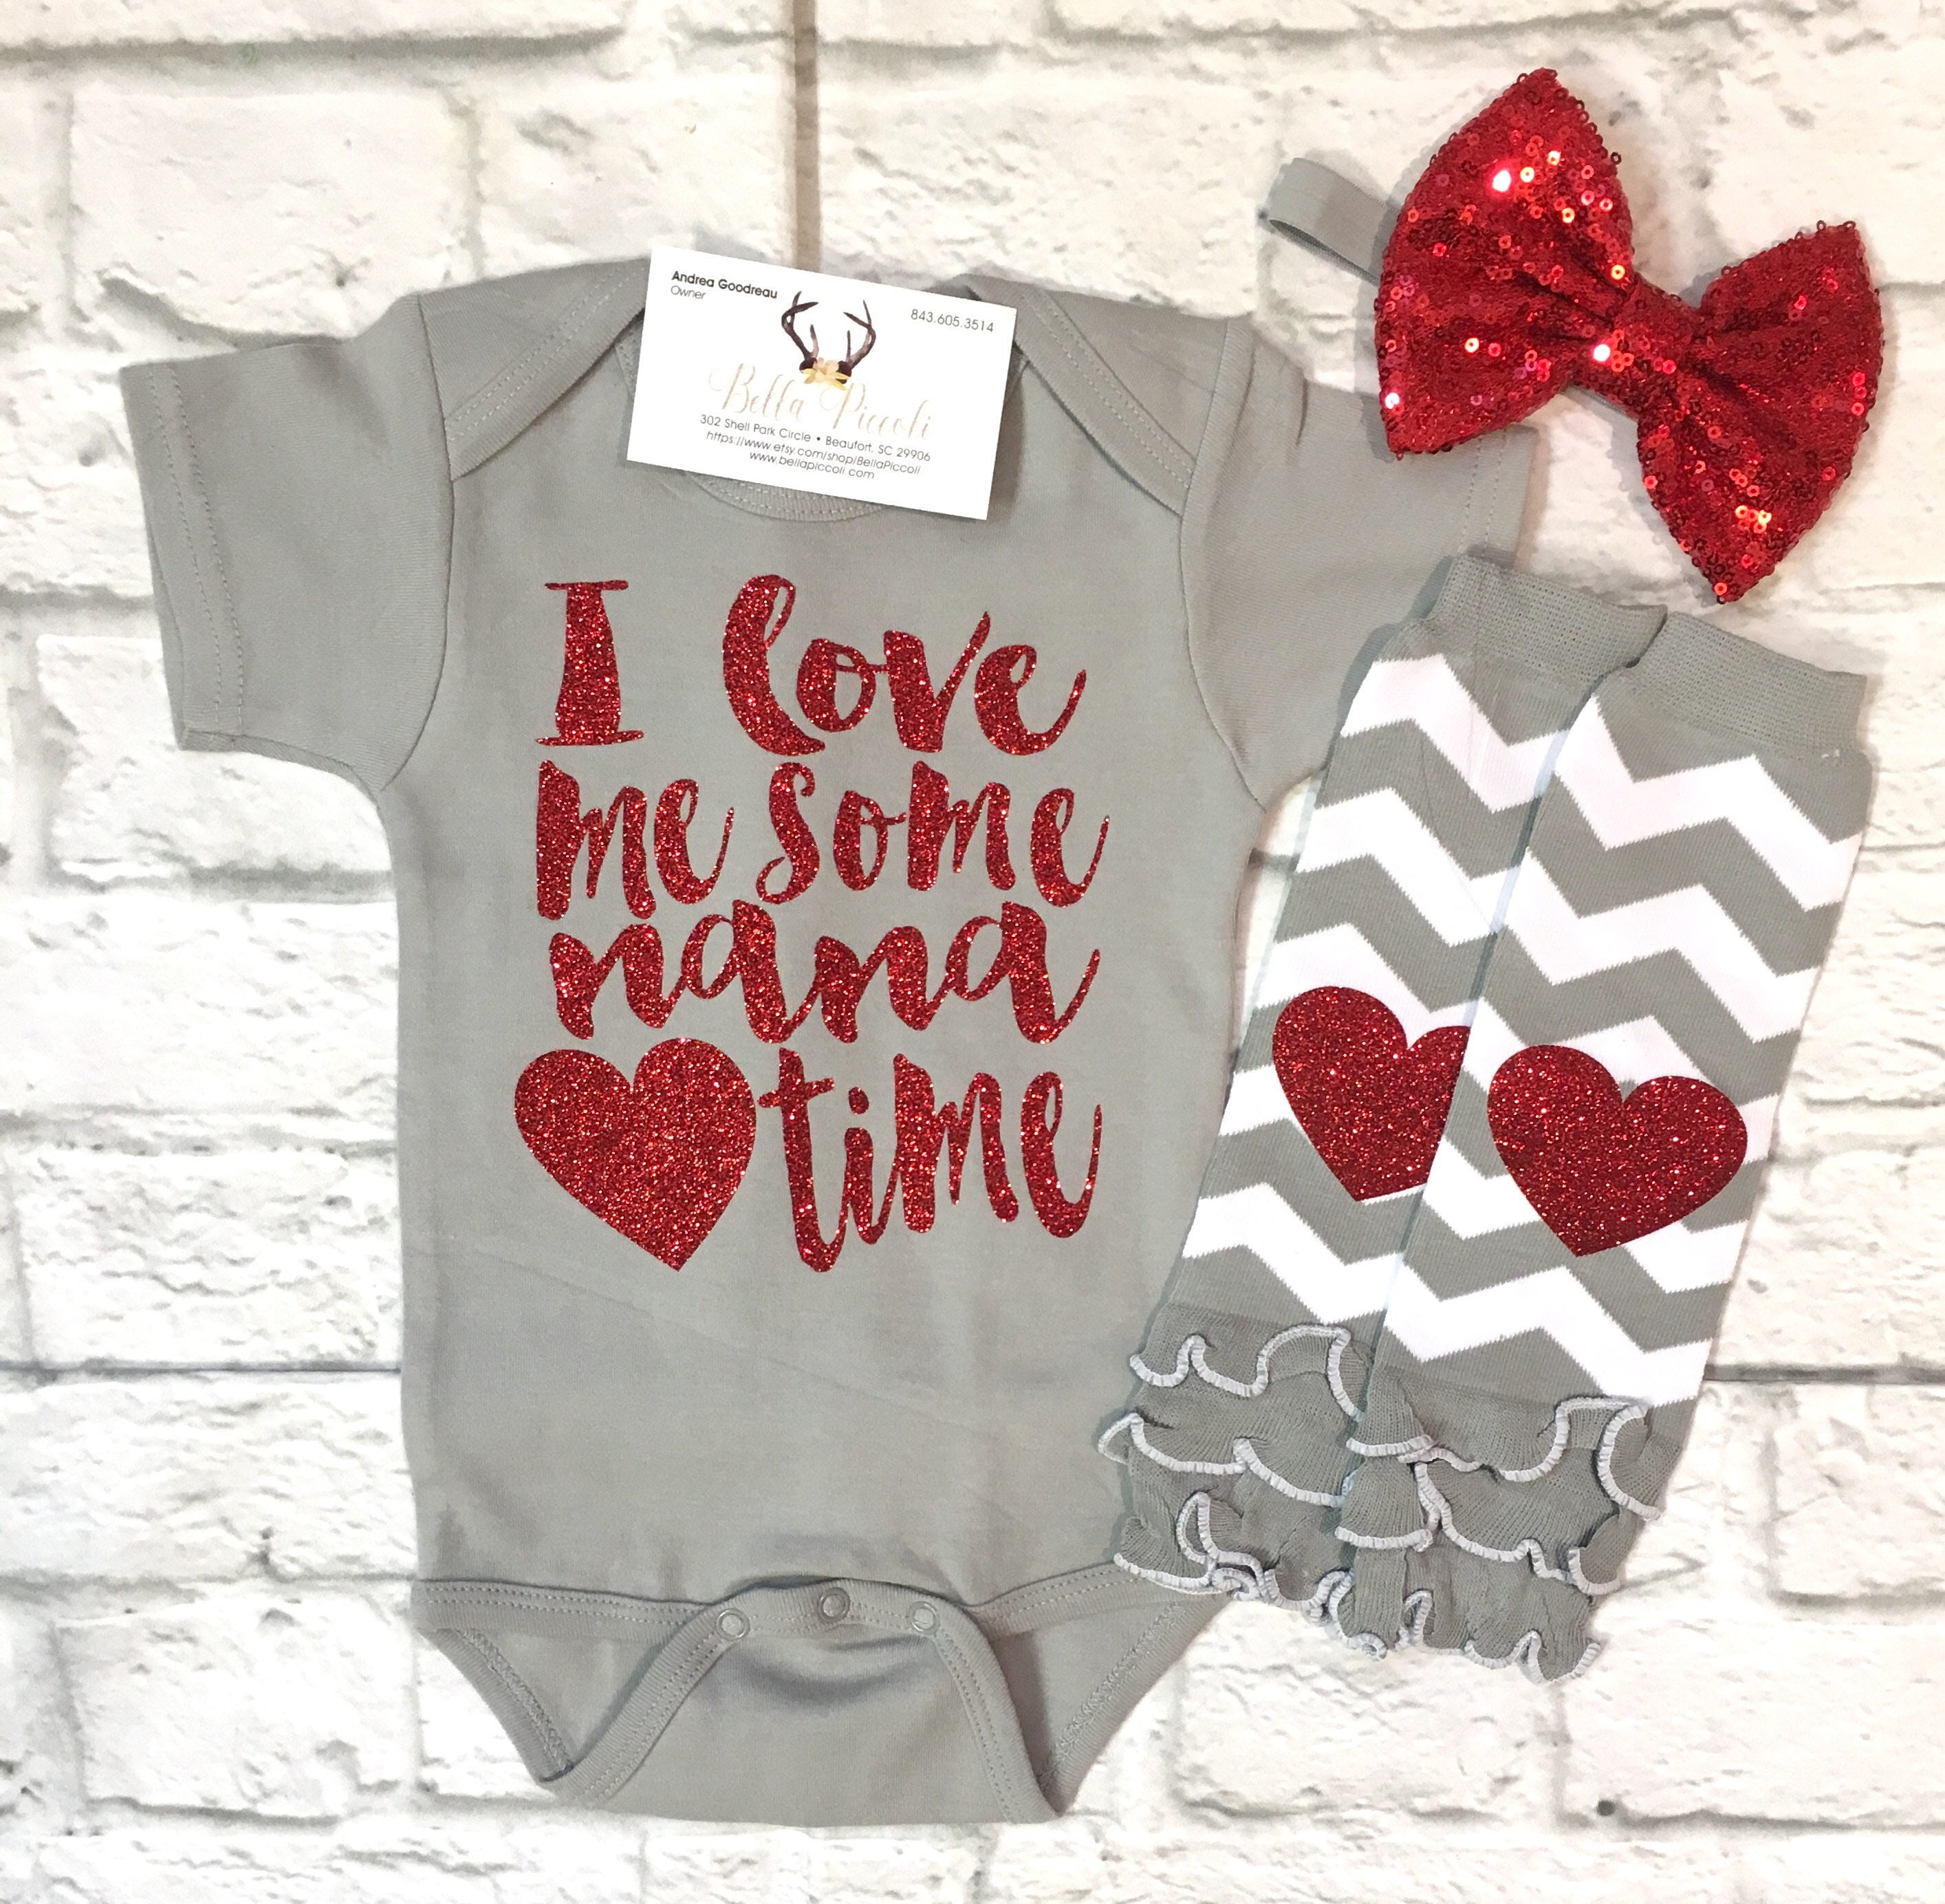 Baby Girl Clothes Nana Shirts I Love Me Some Nana Time